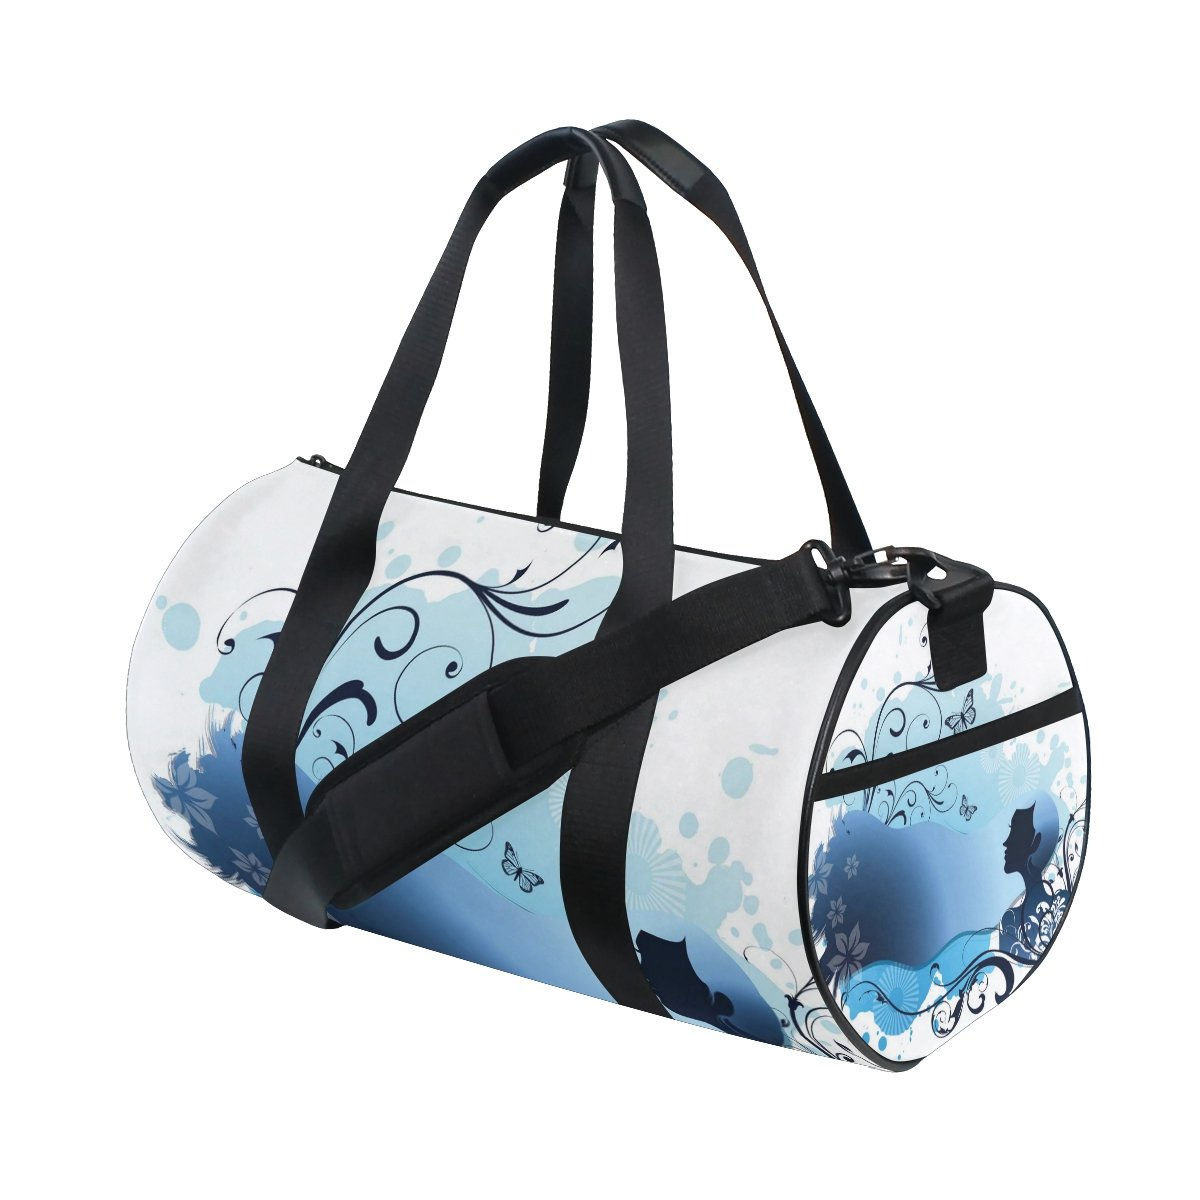 Anime Girl Butterfly Blue Flowers Lightweight Canvas Sports Duffel Yoga Gym Bags